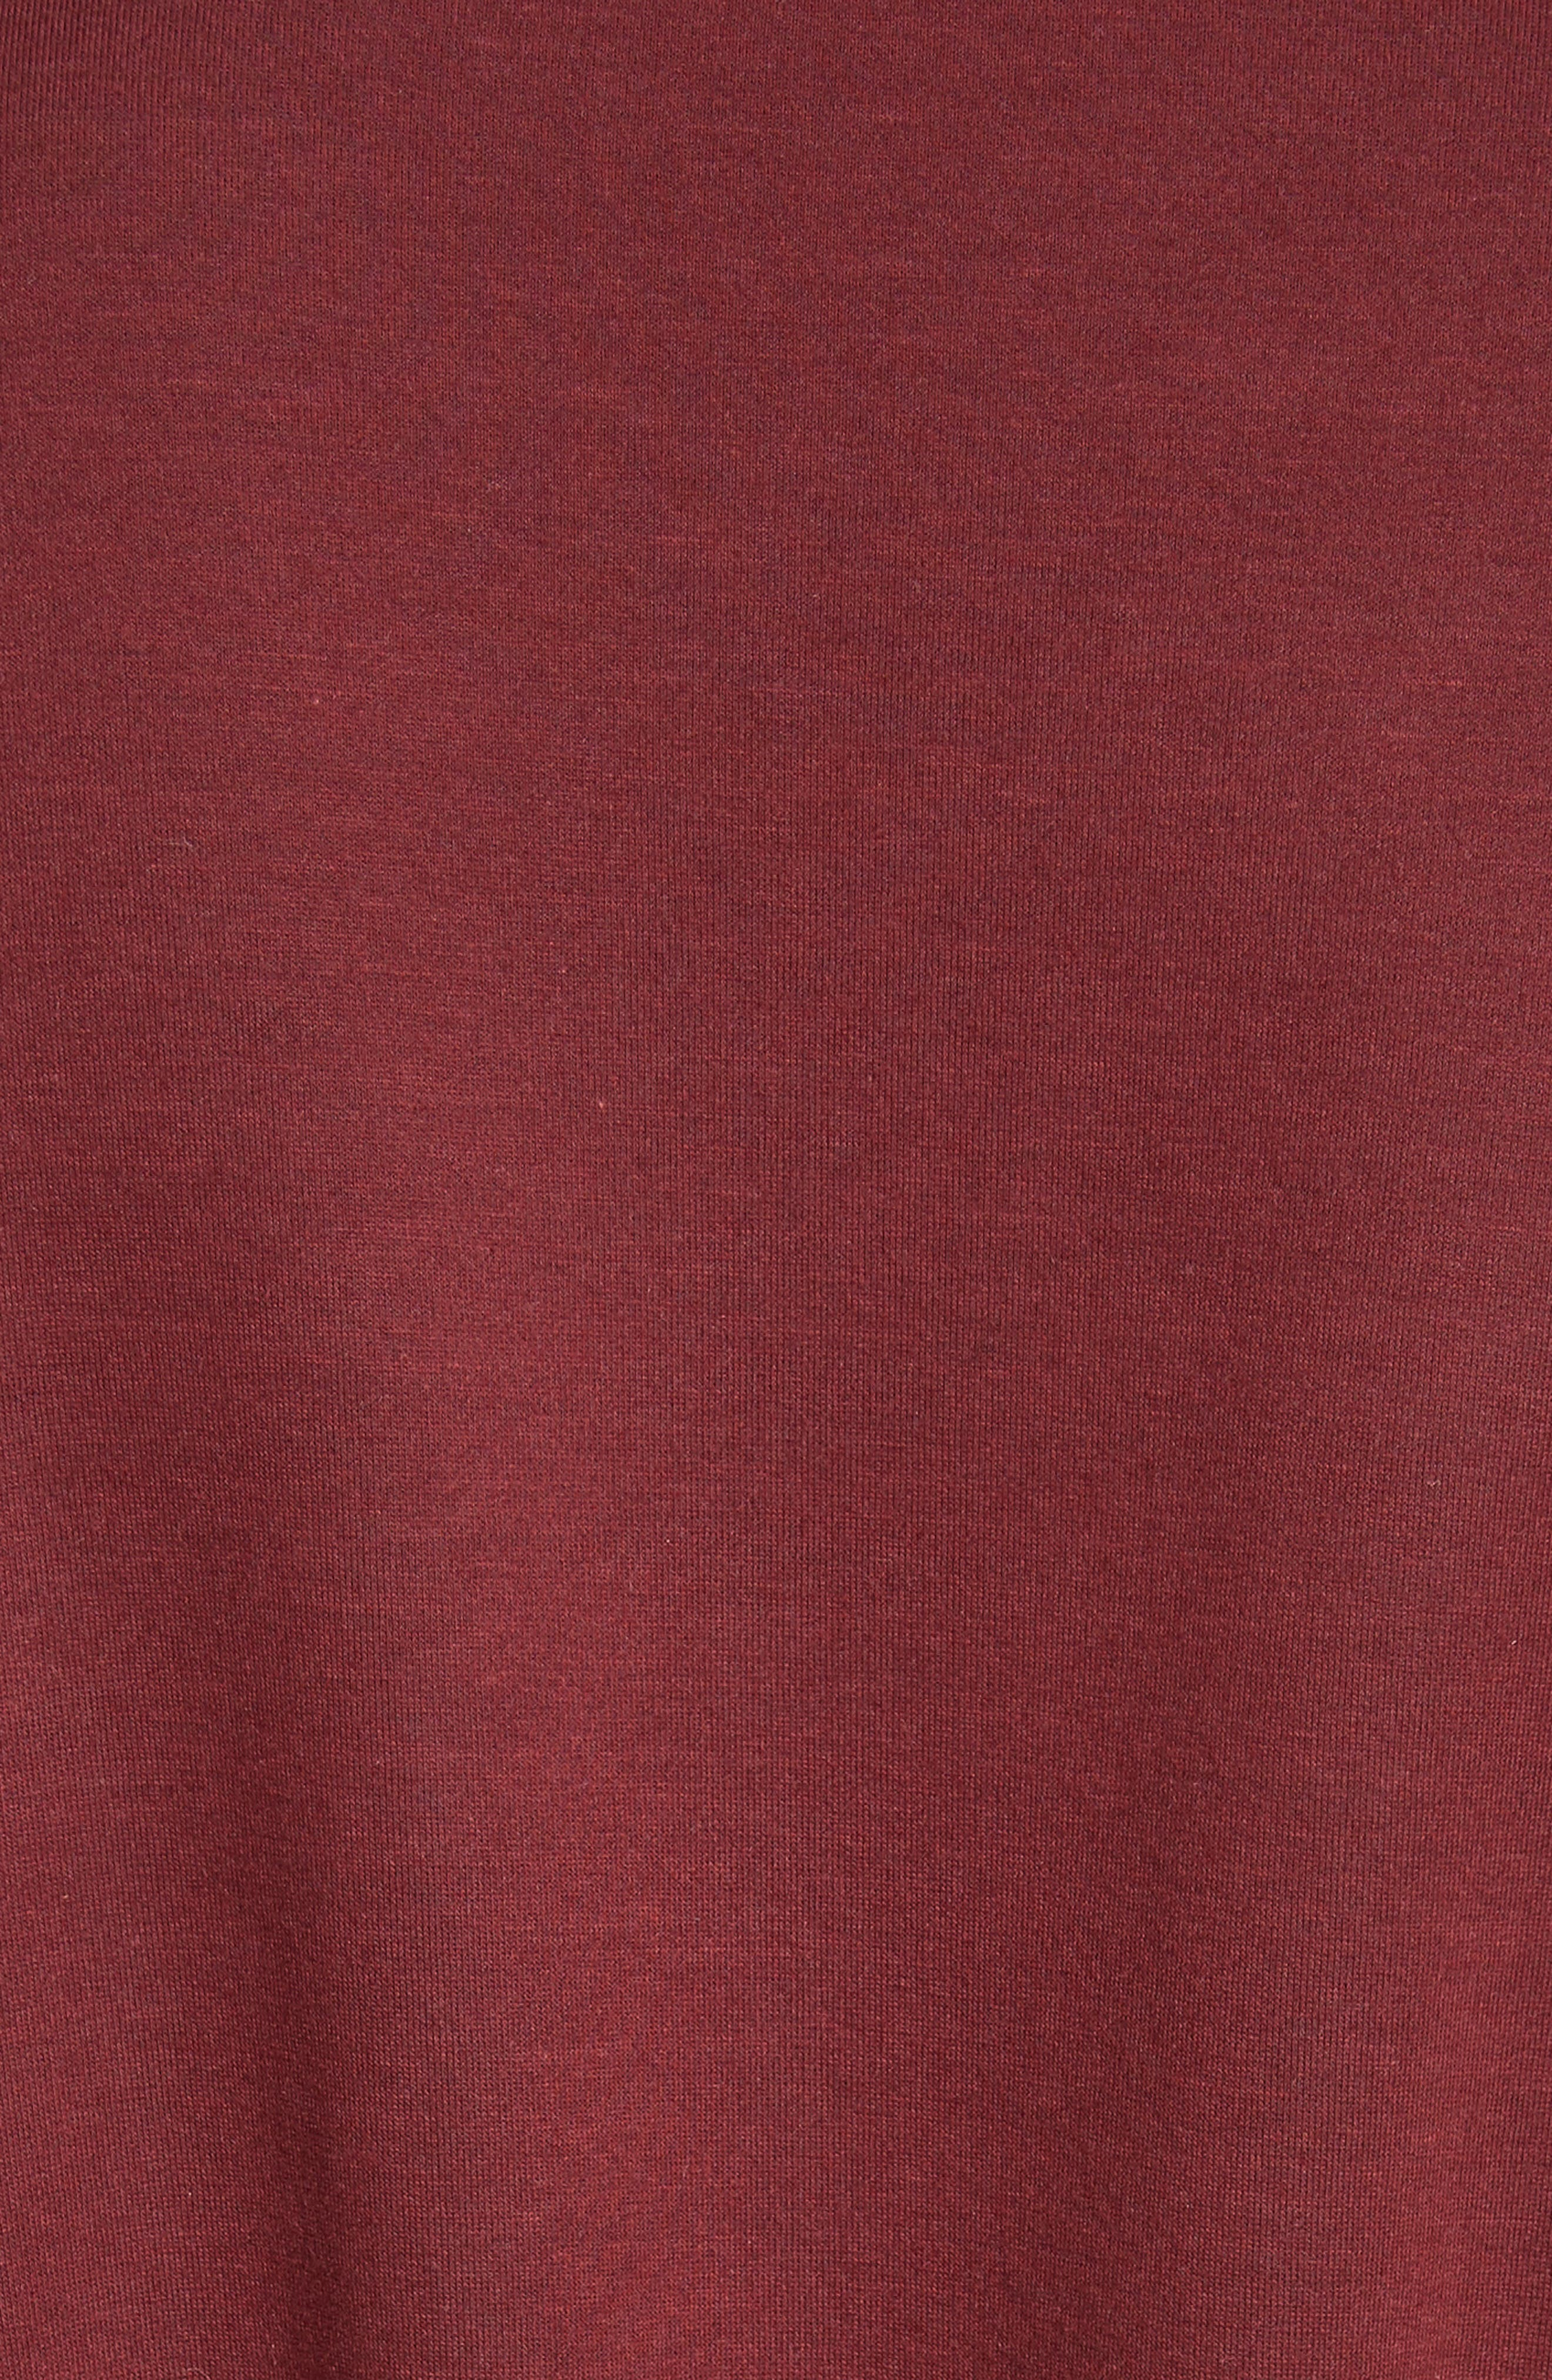 Ruched Ruffle Waist Sweatshirt,                             Alternate thumbnail 5, color,                             Dark Burgundy